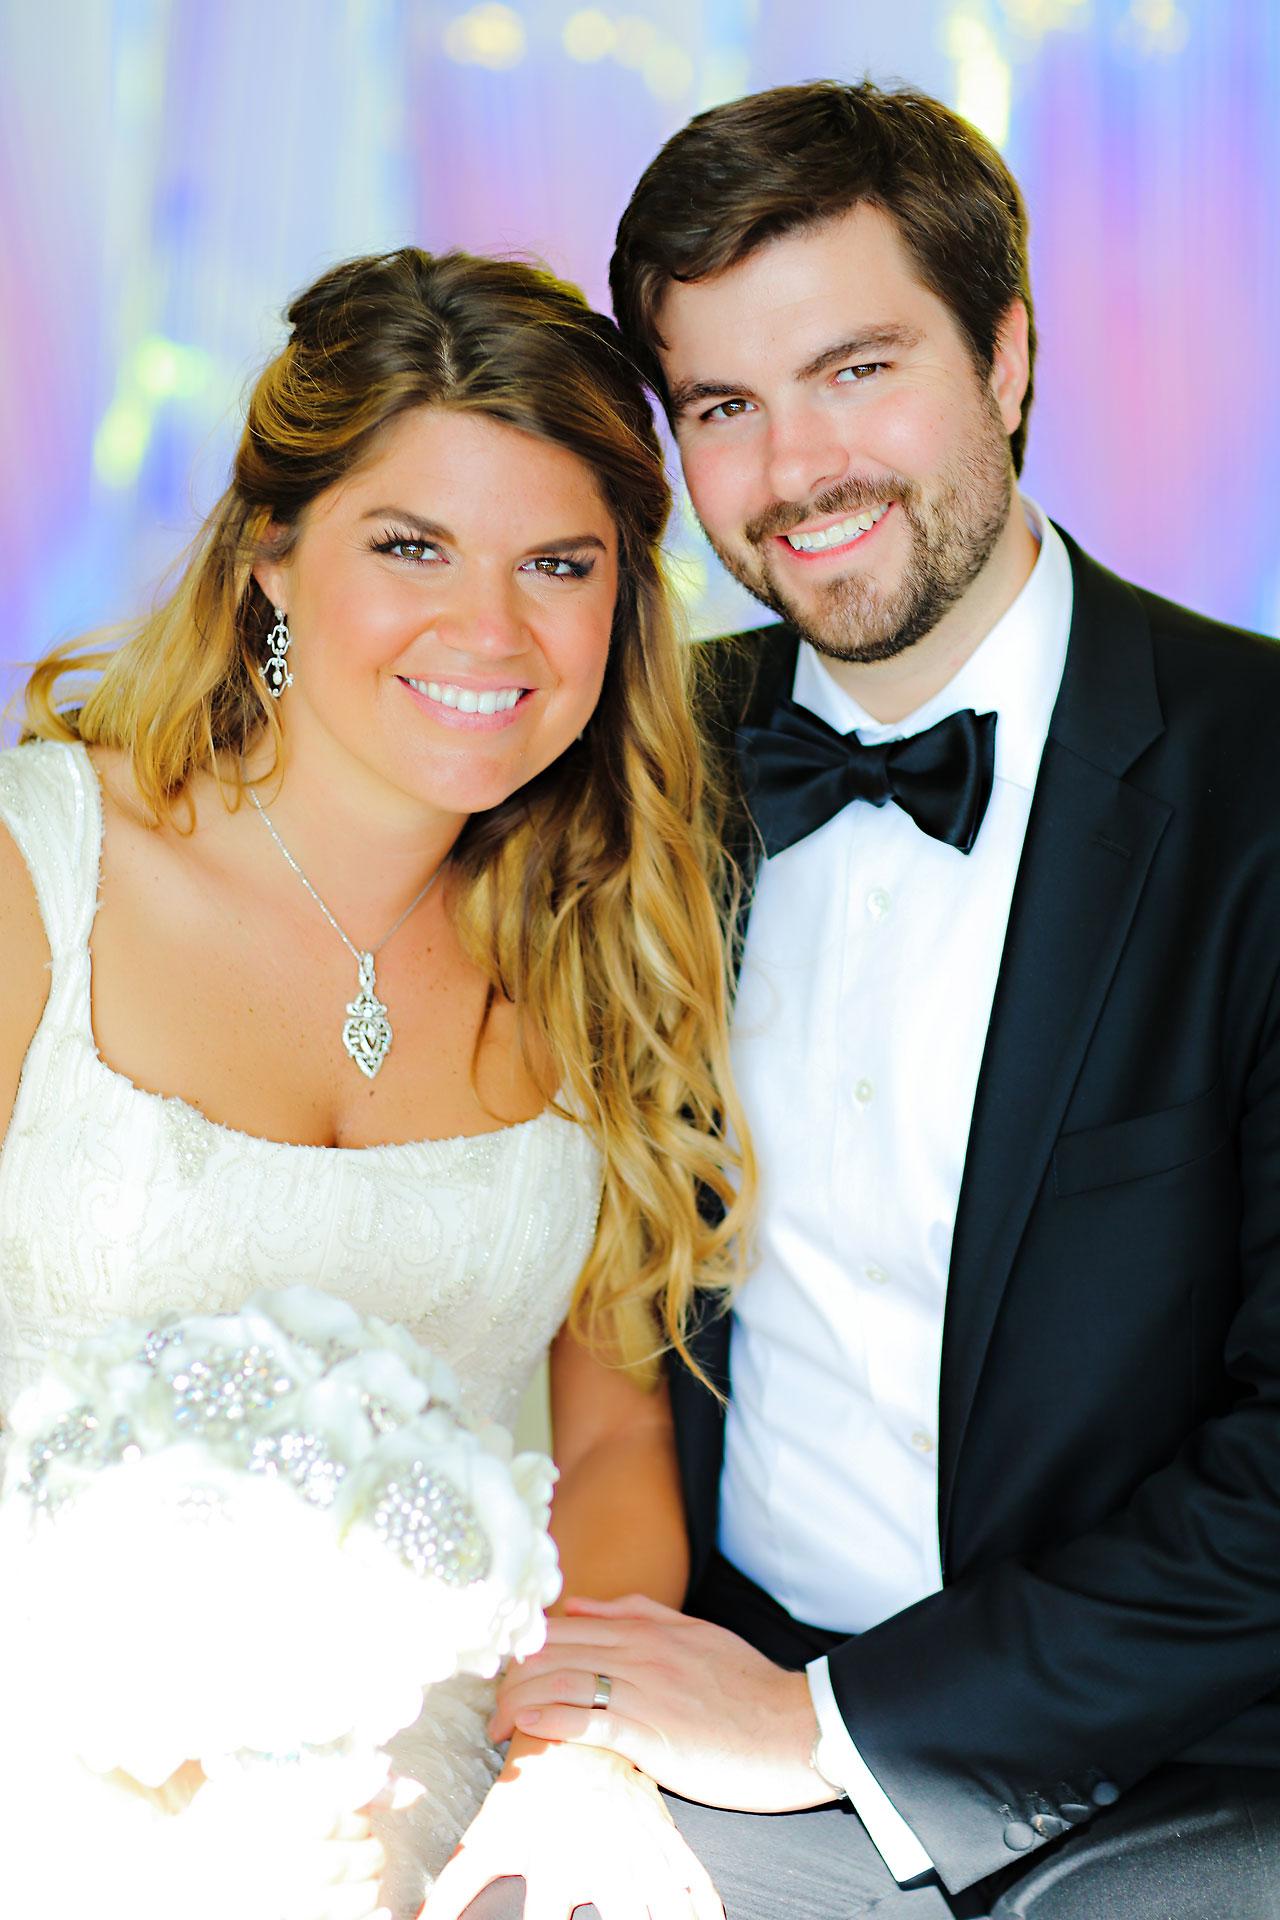 Amy Nick Canal 337 Wedding 140